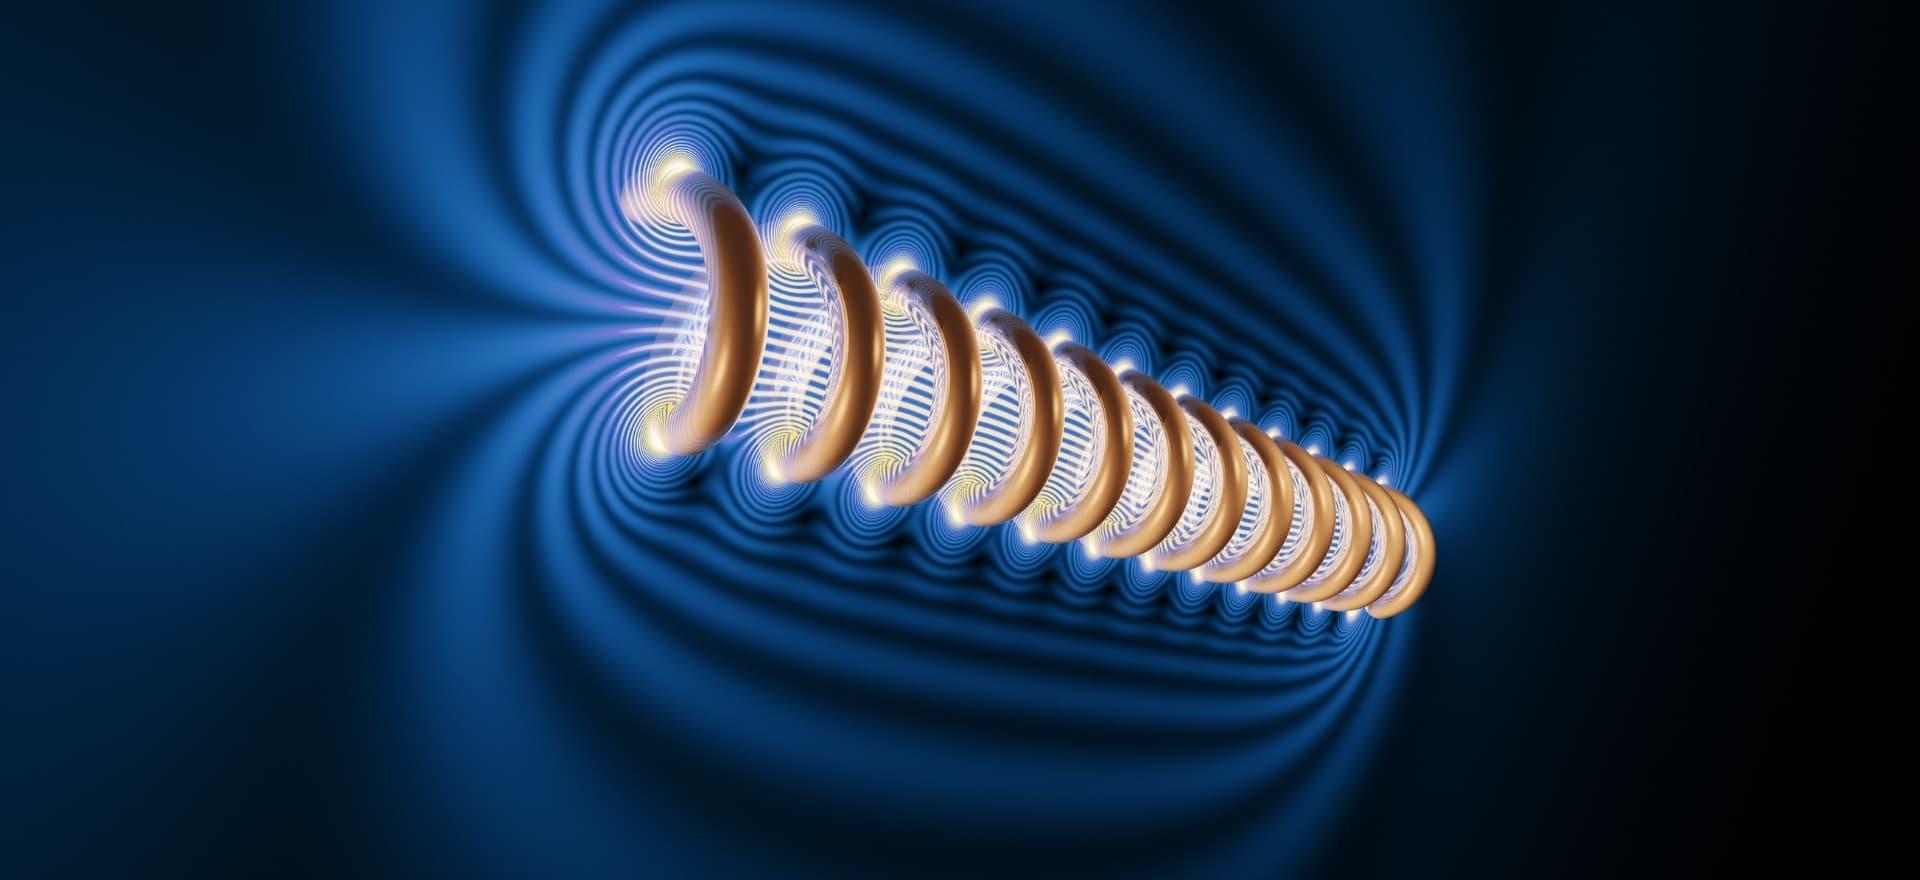 electromagnetic disturbances